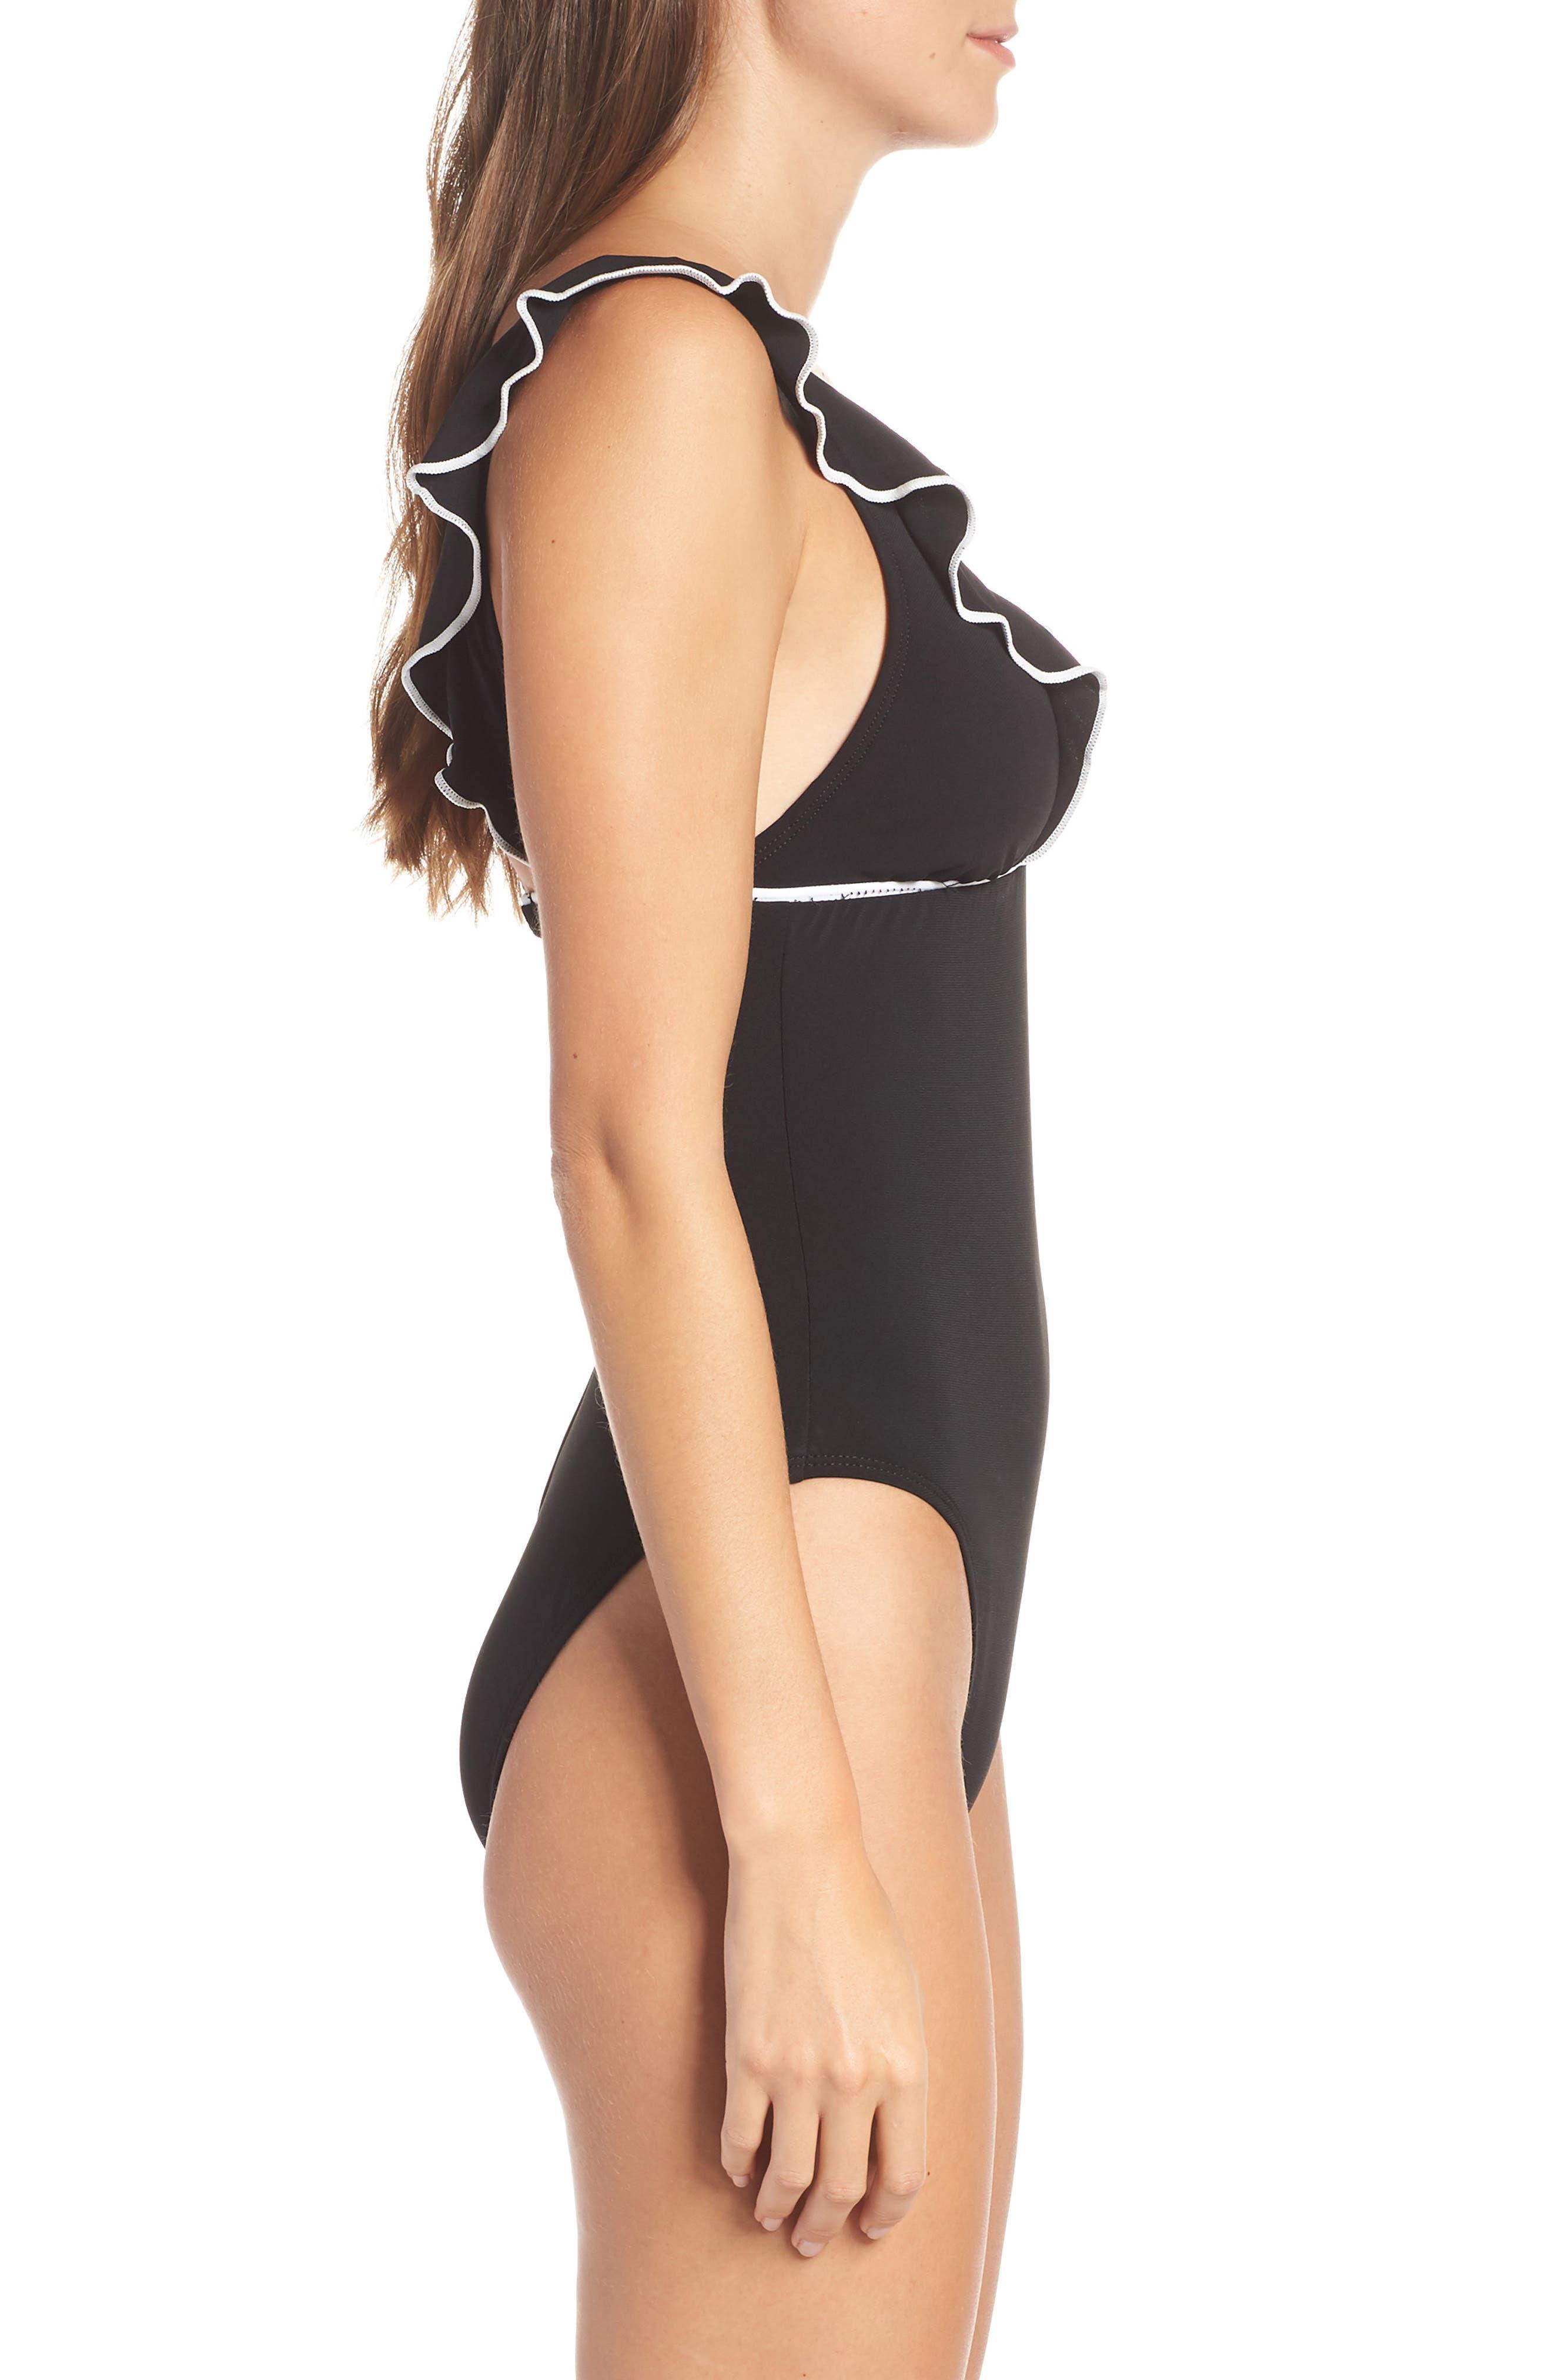 ROBIN PICCONE, Malia Ruffle One-Piece Swimsuit, Alternate thumbnail 3, color, BLACK/ WHITE